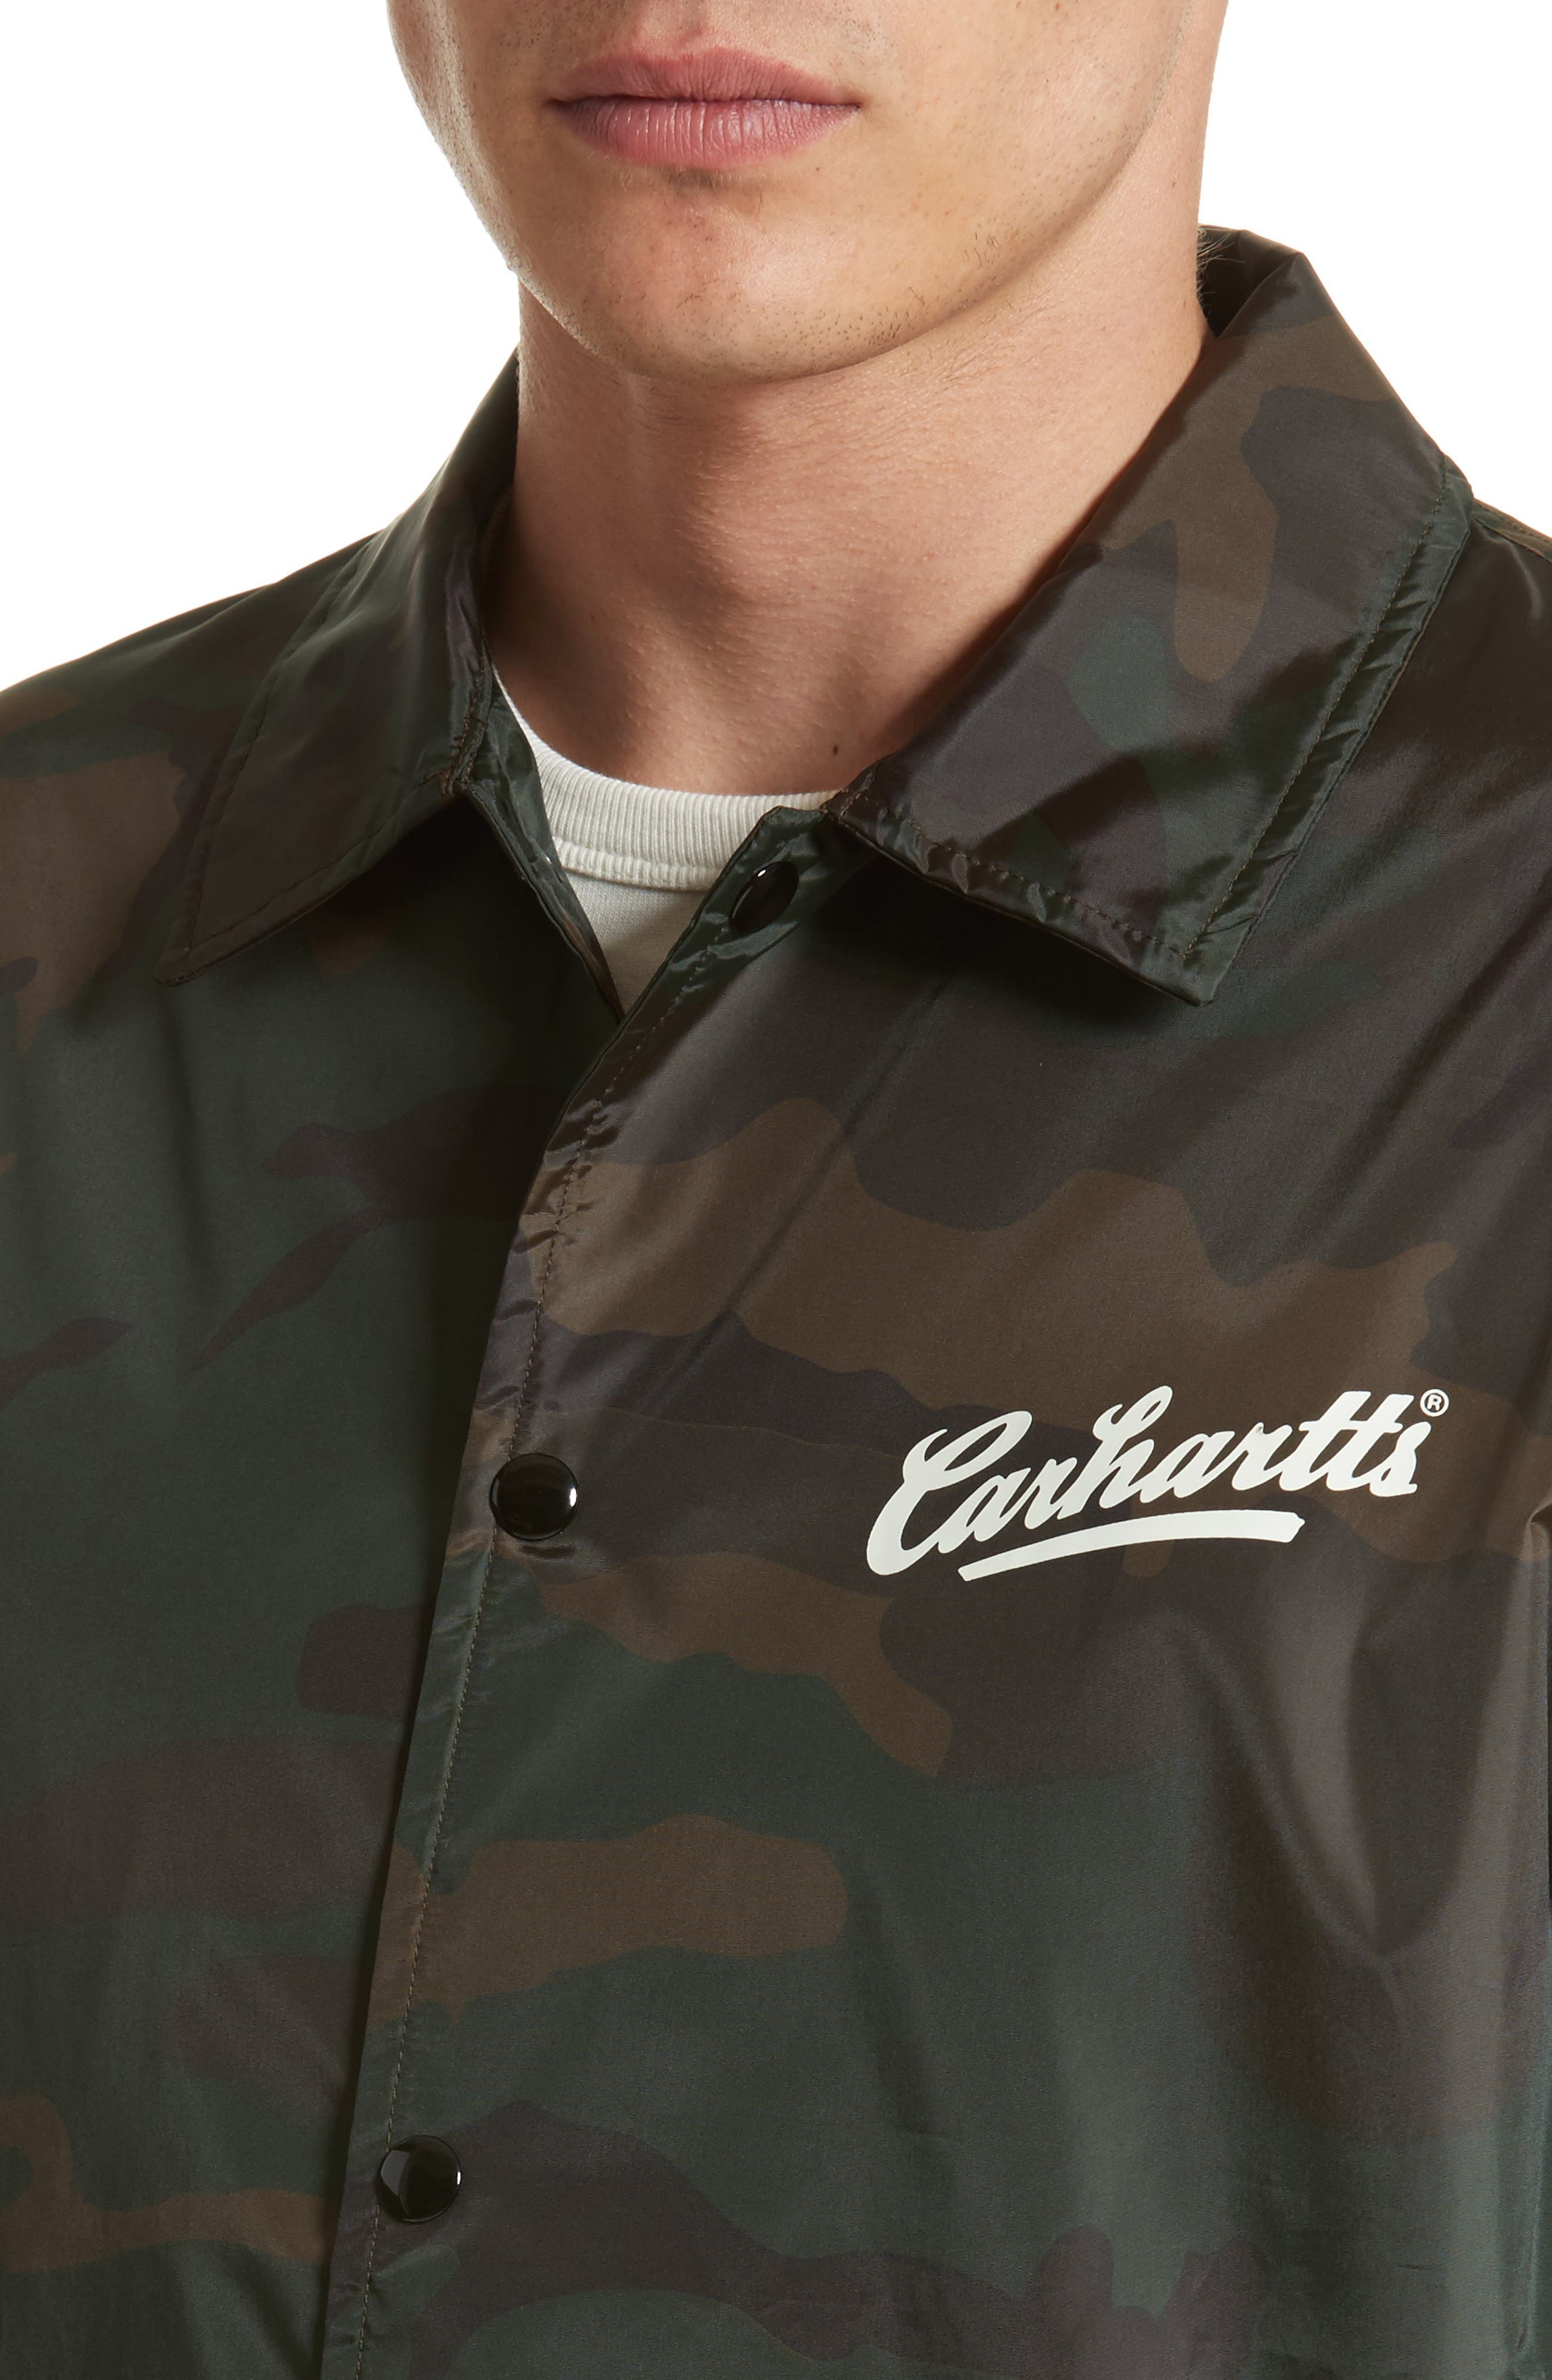 Camo Print Coach Jacket,                             Alternate thumbnail 4, color,                             Camo Combat Green/White